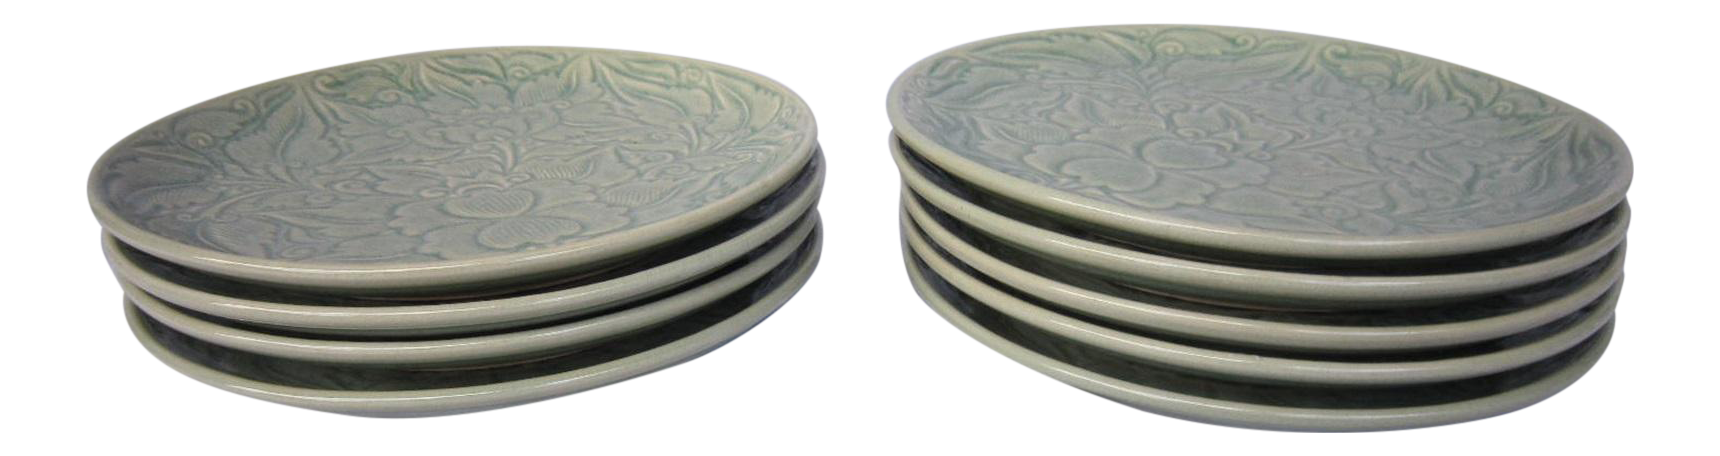 Thai Celadon Plates - S/9 - Image 1 of 5  sc 1 st  Chairish & Thai Celadon Plates - S/9 | Chairish